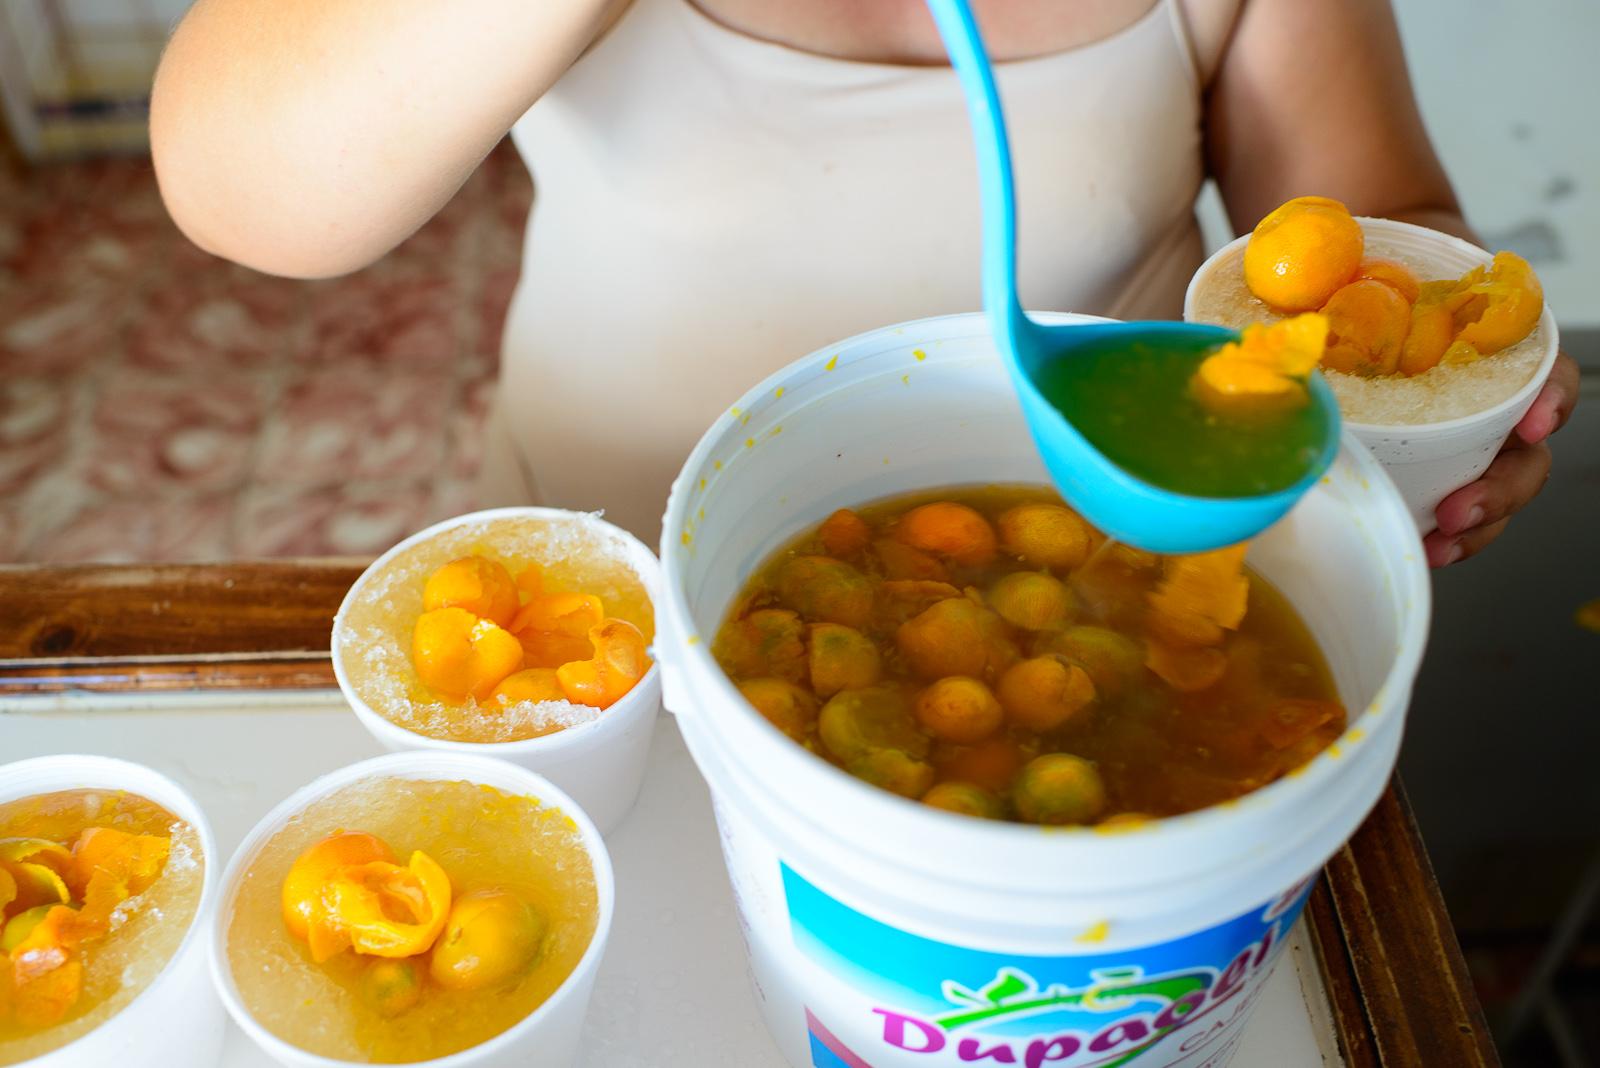 Naranjitas, small bitter oranges soakedin syrup